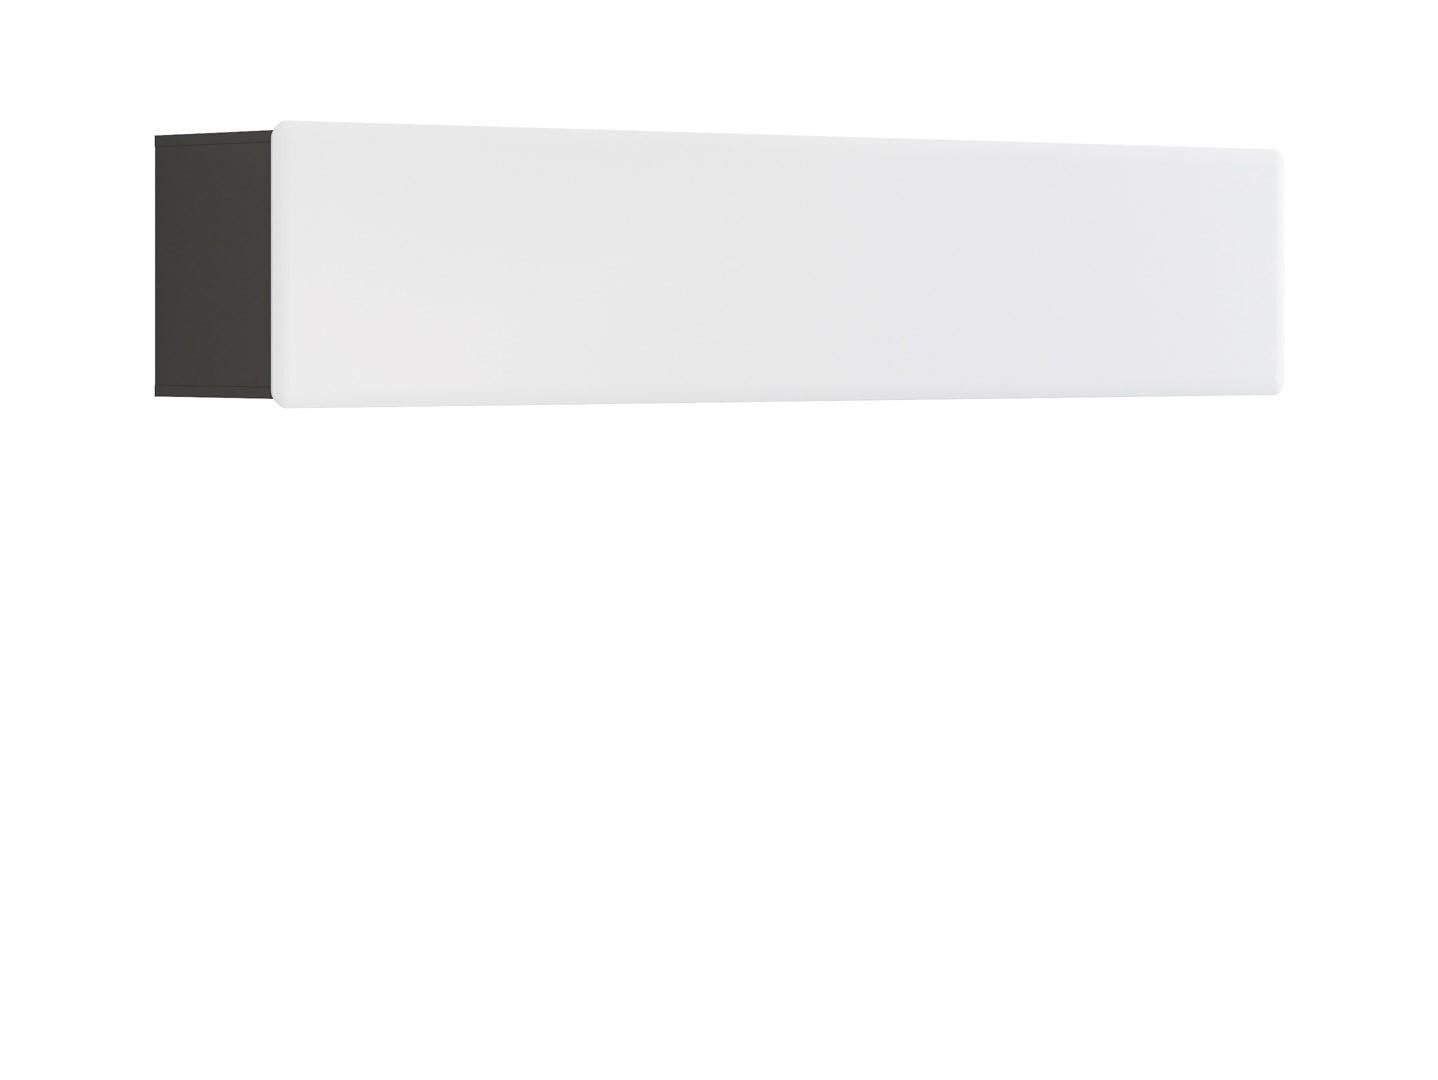 Polička - BRW - Possi Light SFW1K/4/20 (šedý wolfram + lesk bílý)